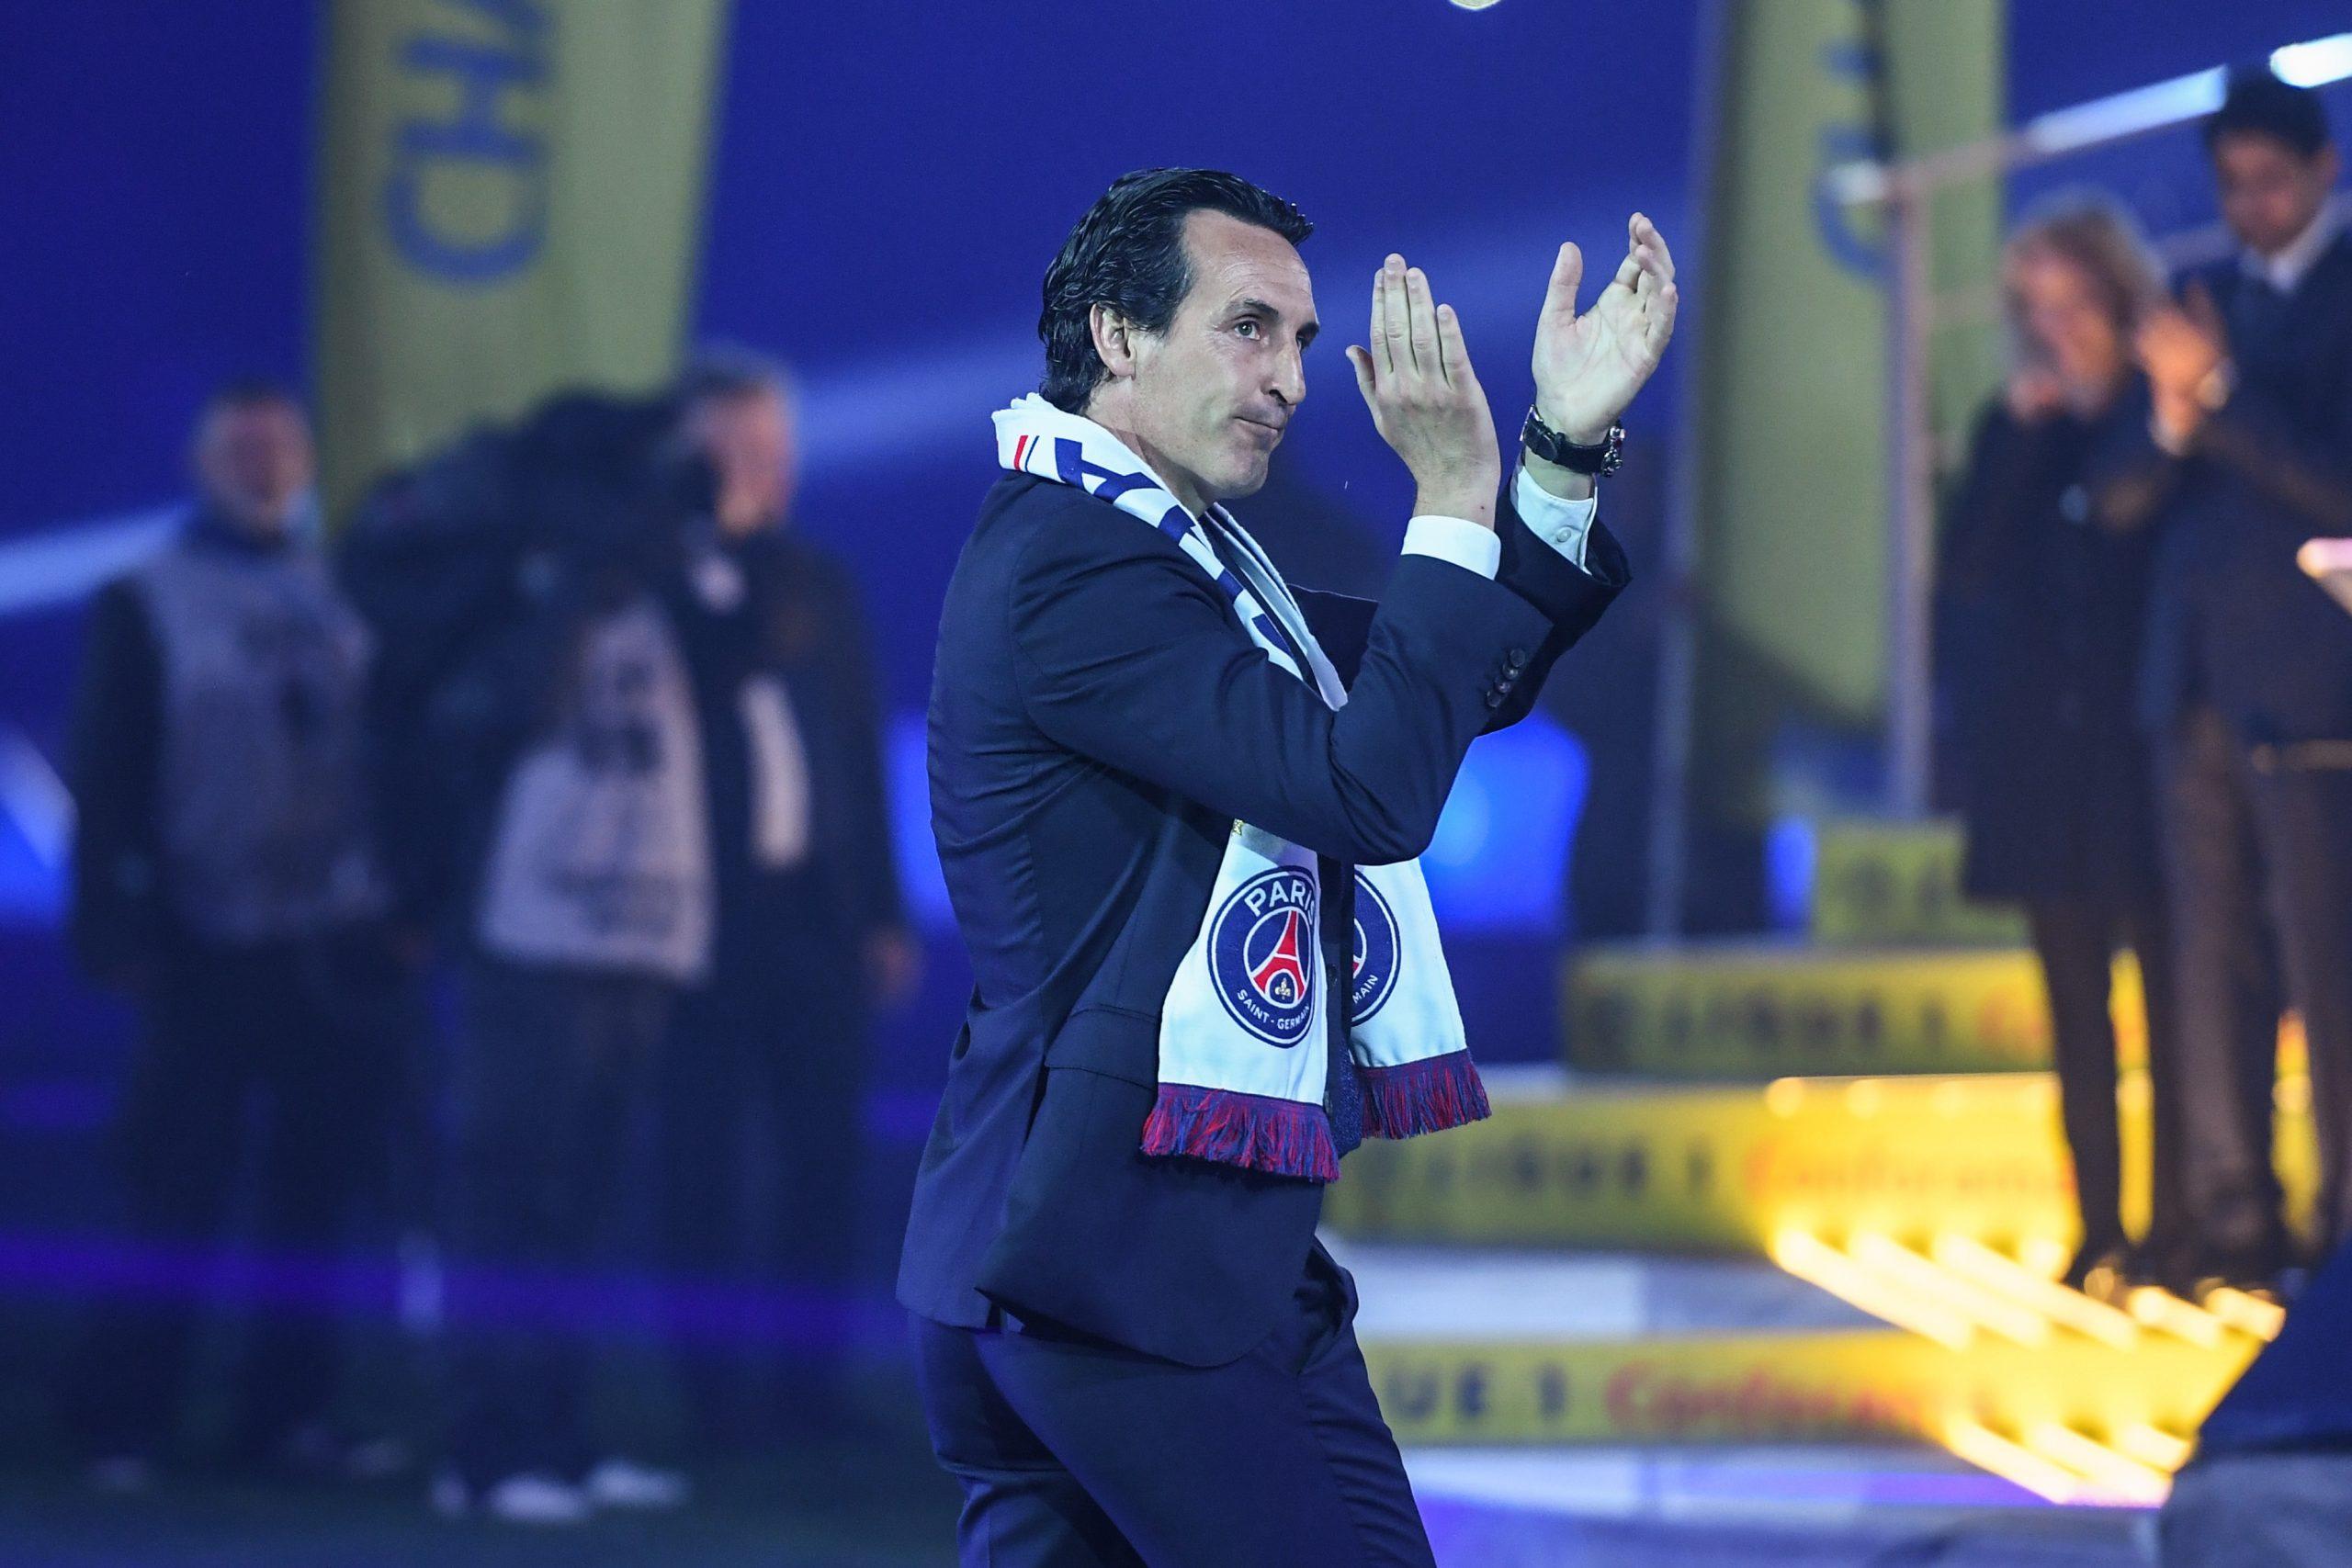 Emery assure que le PSG gagnera la Ligue des Champions «c'est un très grand club»